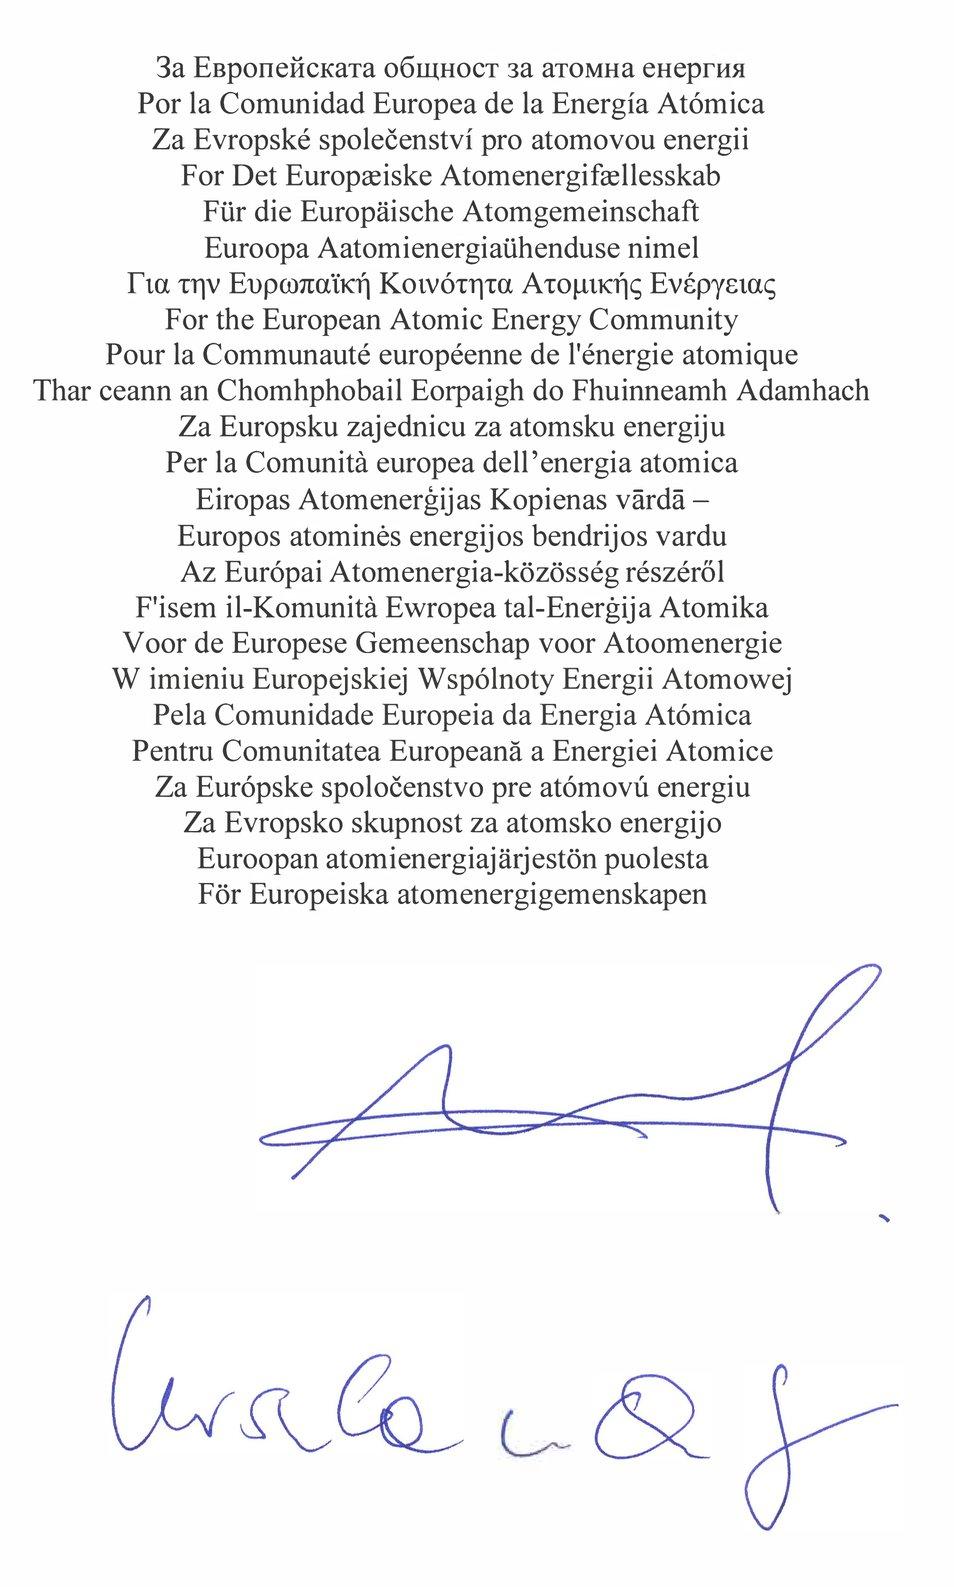 Imagen: https://eur-lex.europa.eu/resource.html?uri=uriserv:OJ.L_.2020.029.01.0007.01.SPA.xhtml.L_2020029ES.01009901.tif.jpg